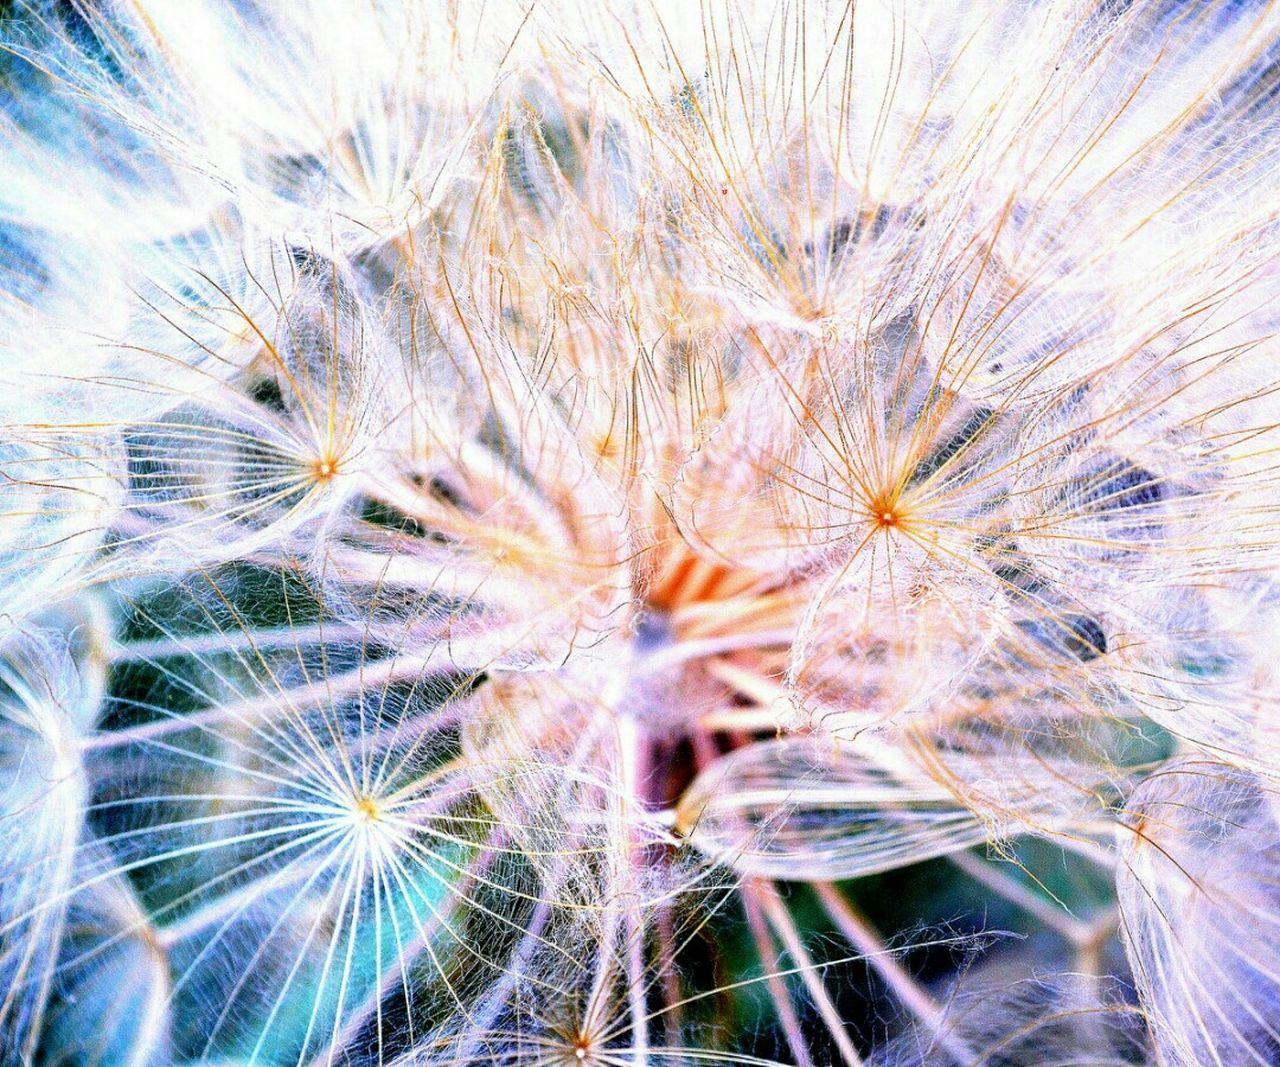 Microcosm Pjpink Microcosm Abstract Eye For Photography EyeEm